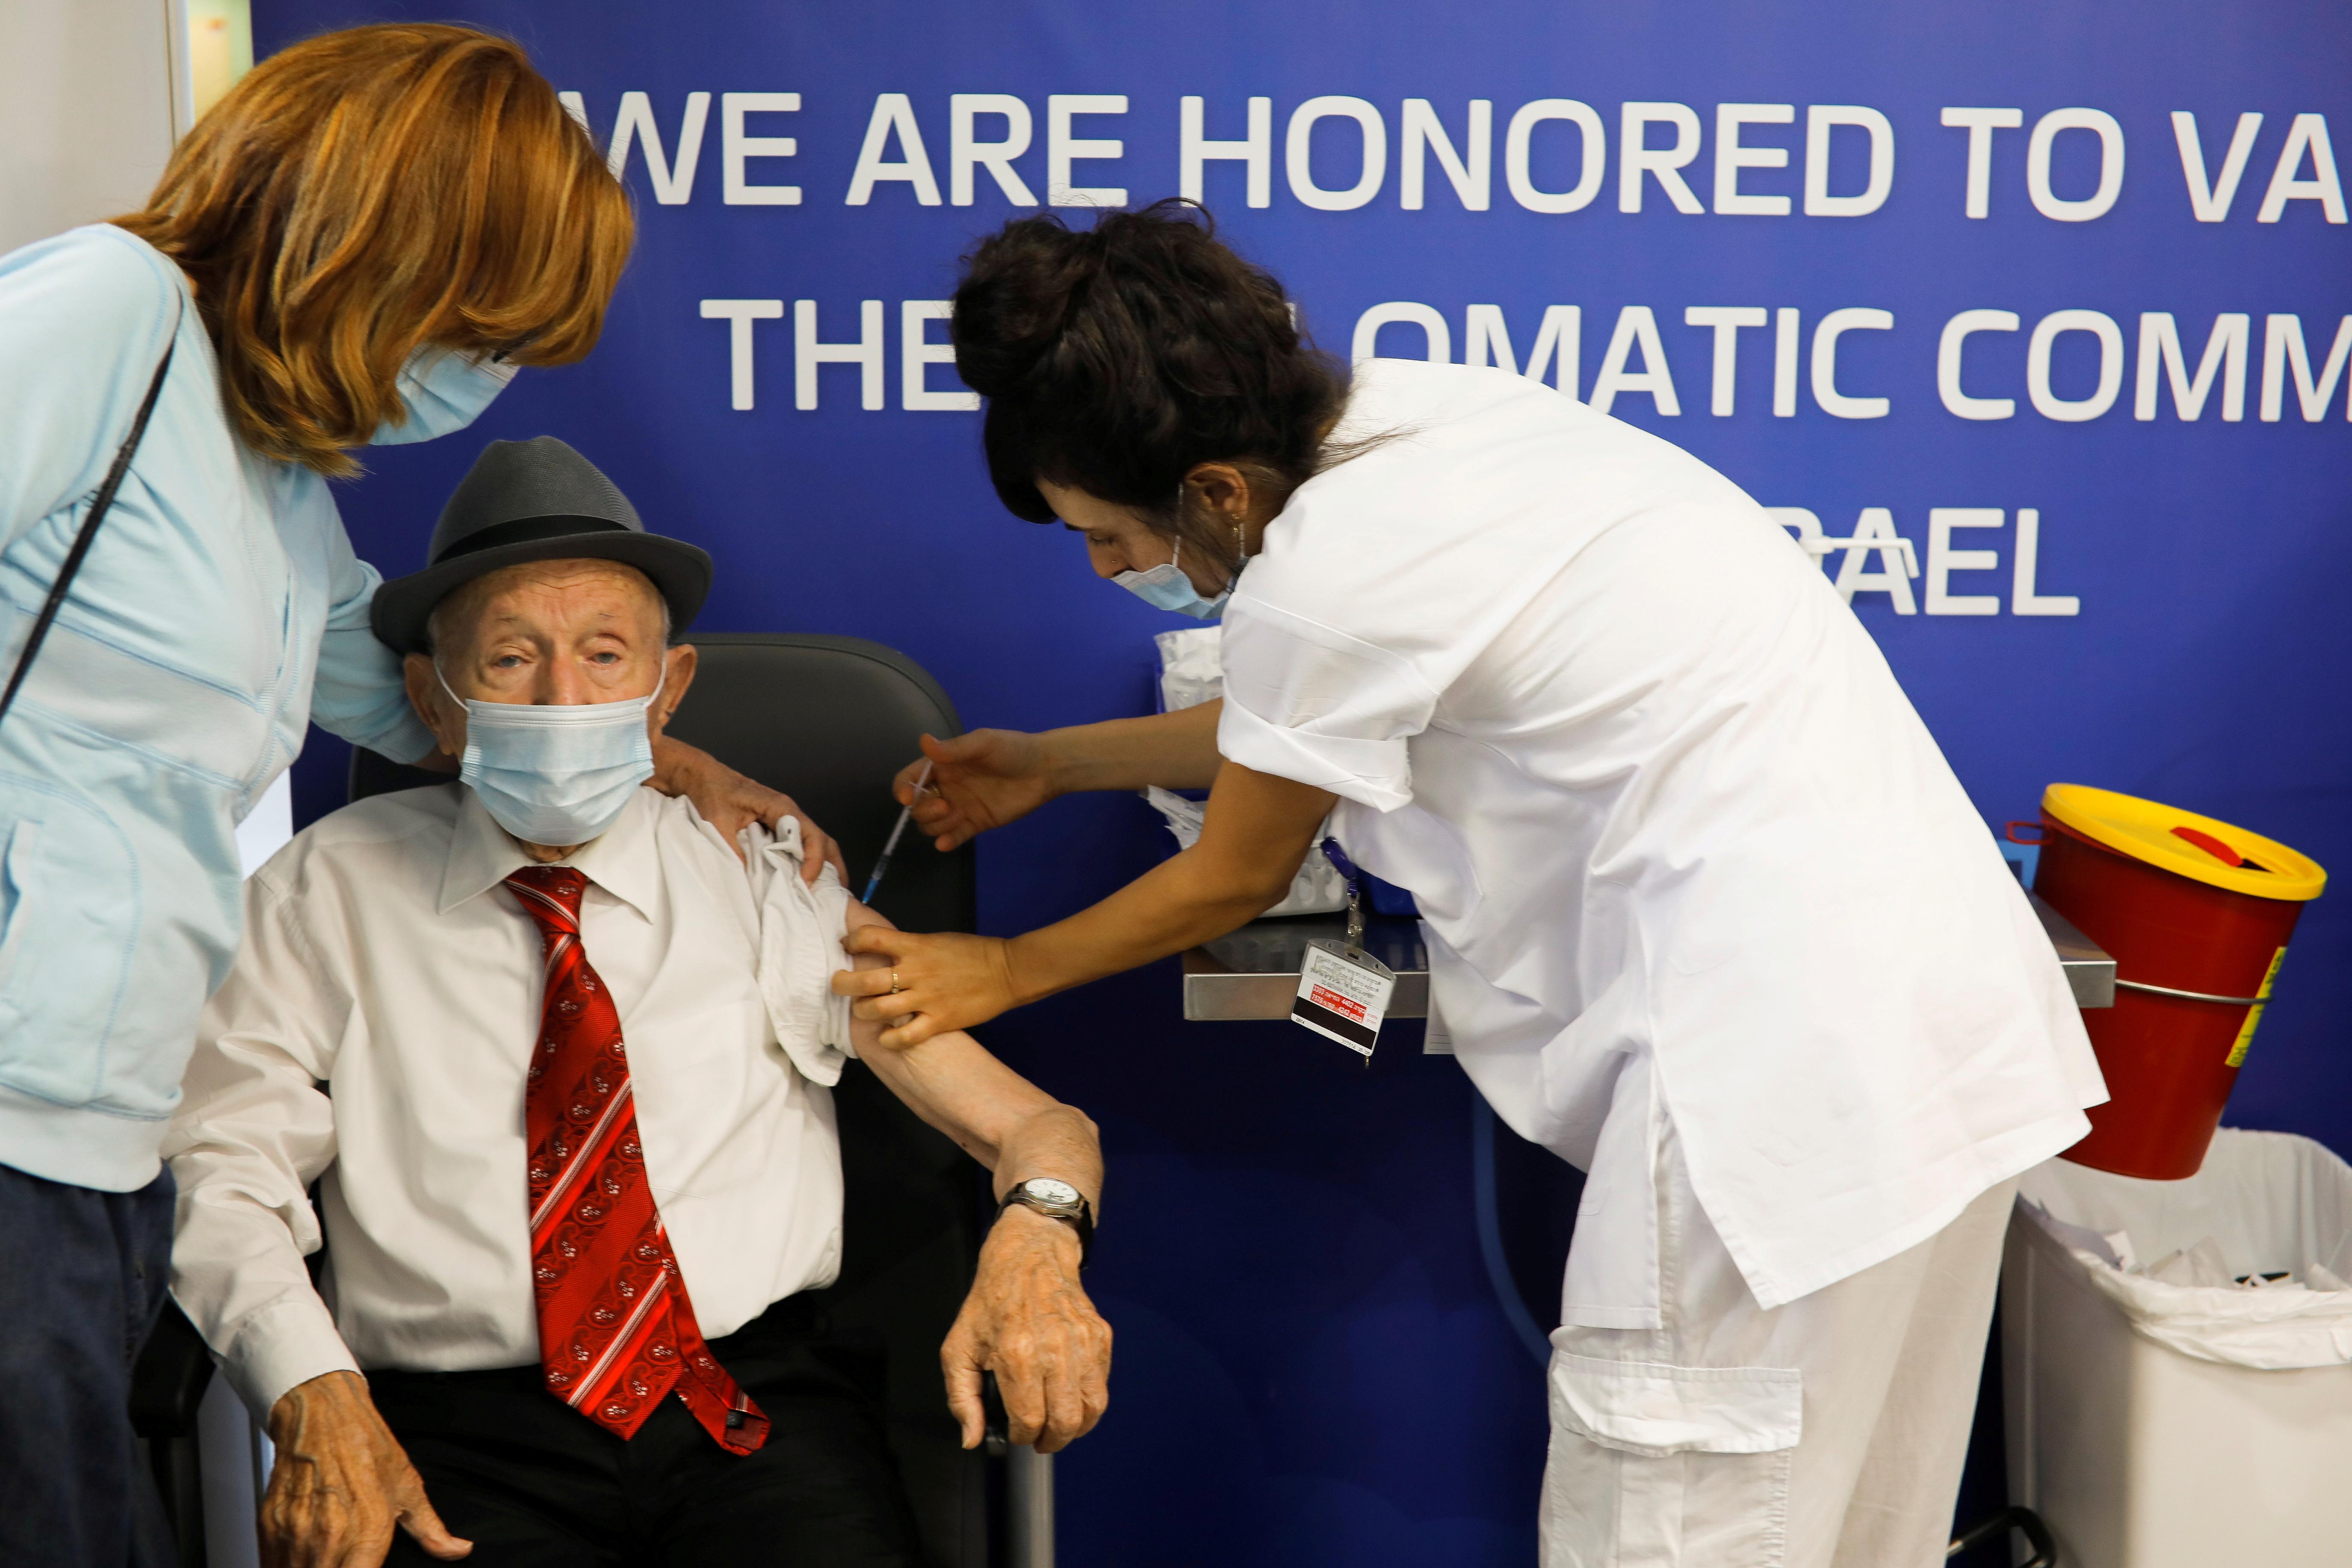 Holocaust survivor Yehuda Widawski, 102, receives his third dose of a coronavirus disease (COVID-19) vaccine at Sourasky Medical Center (Ichilov Hospital) in Tel Aviv, Israel August 1, 2021.   REUTERS/Nir Elias/File Photo